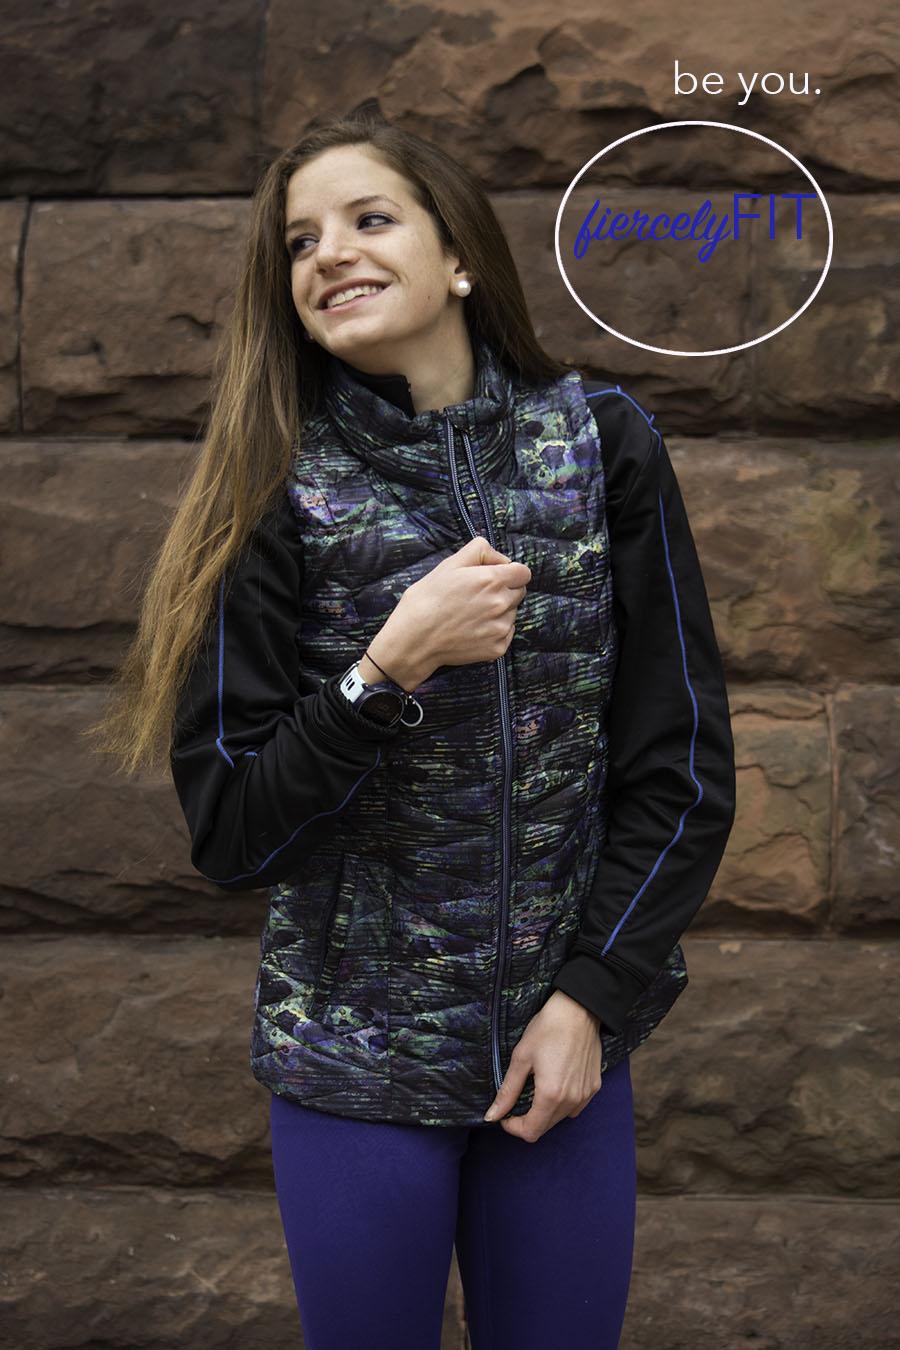 Joy_Lewis_Branding_Athletic_Wear_Fiercly_Fit_Zipping_Jacket_Smiling